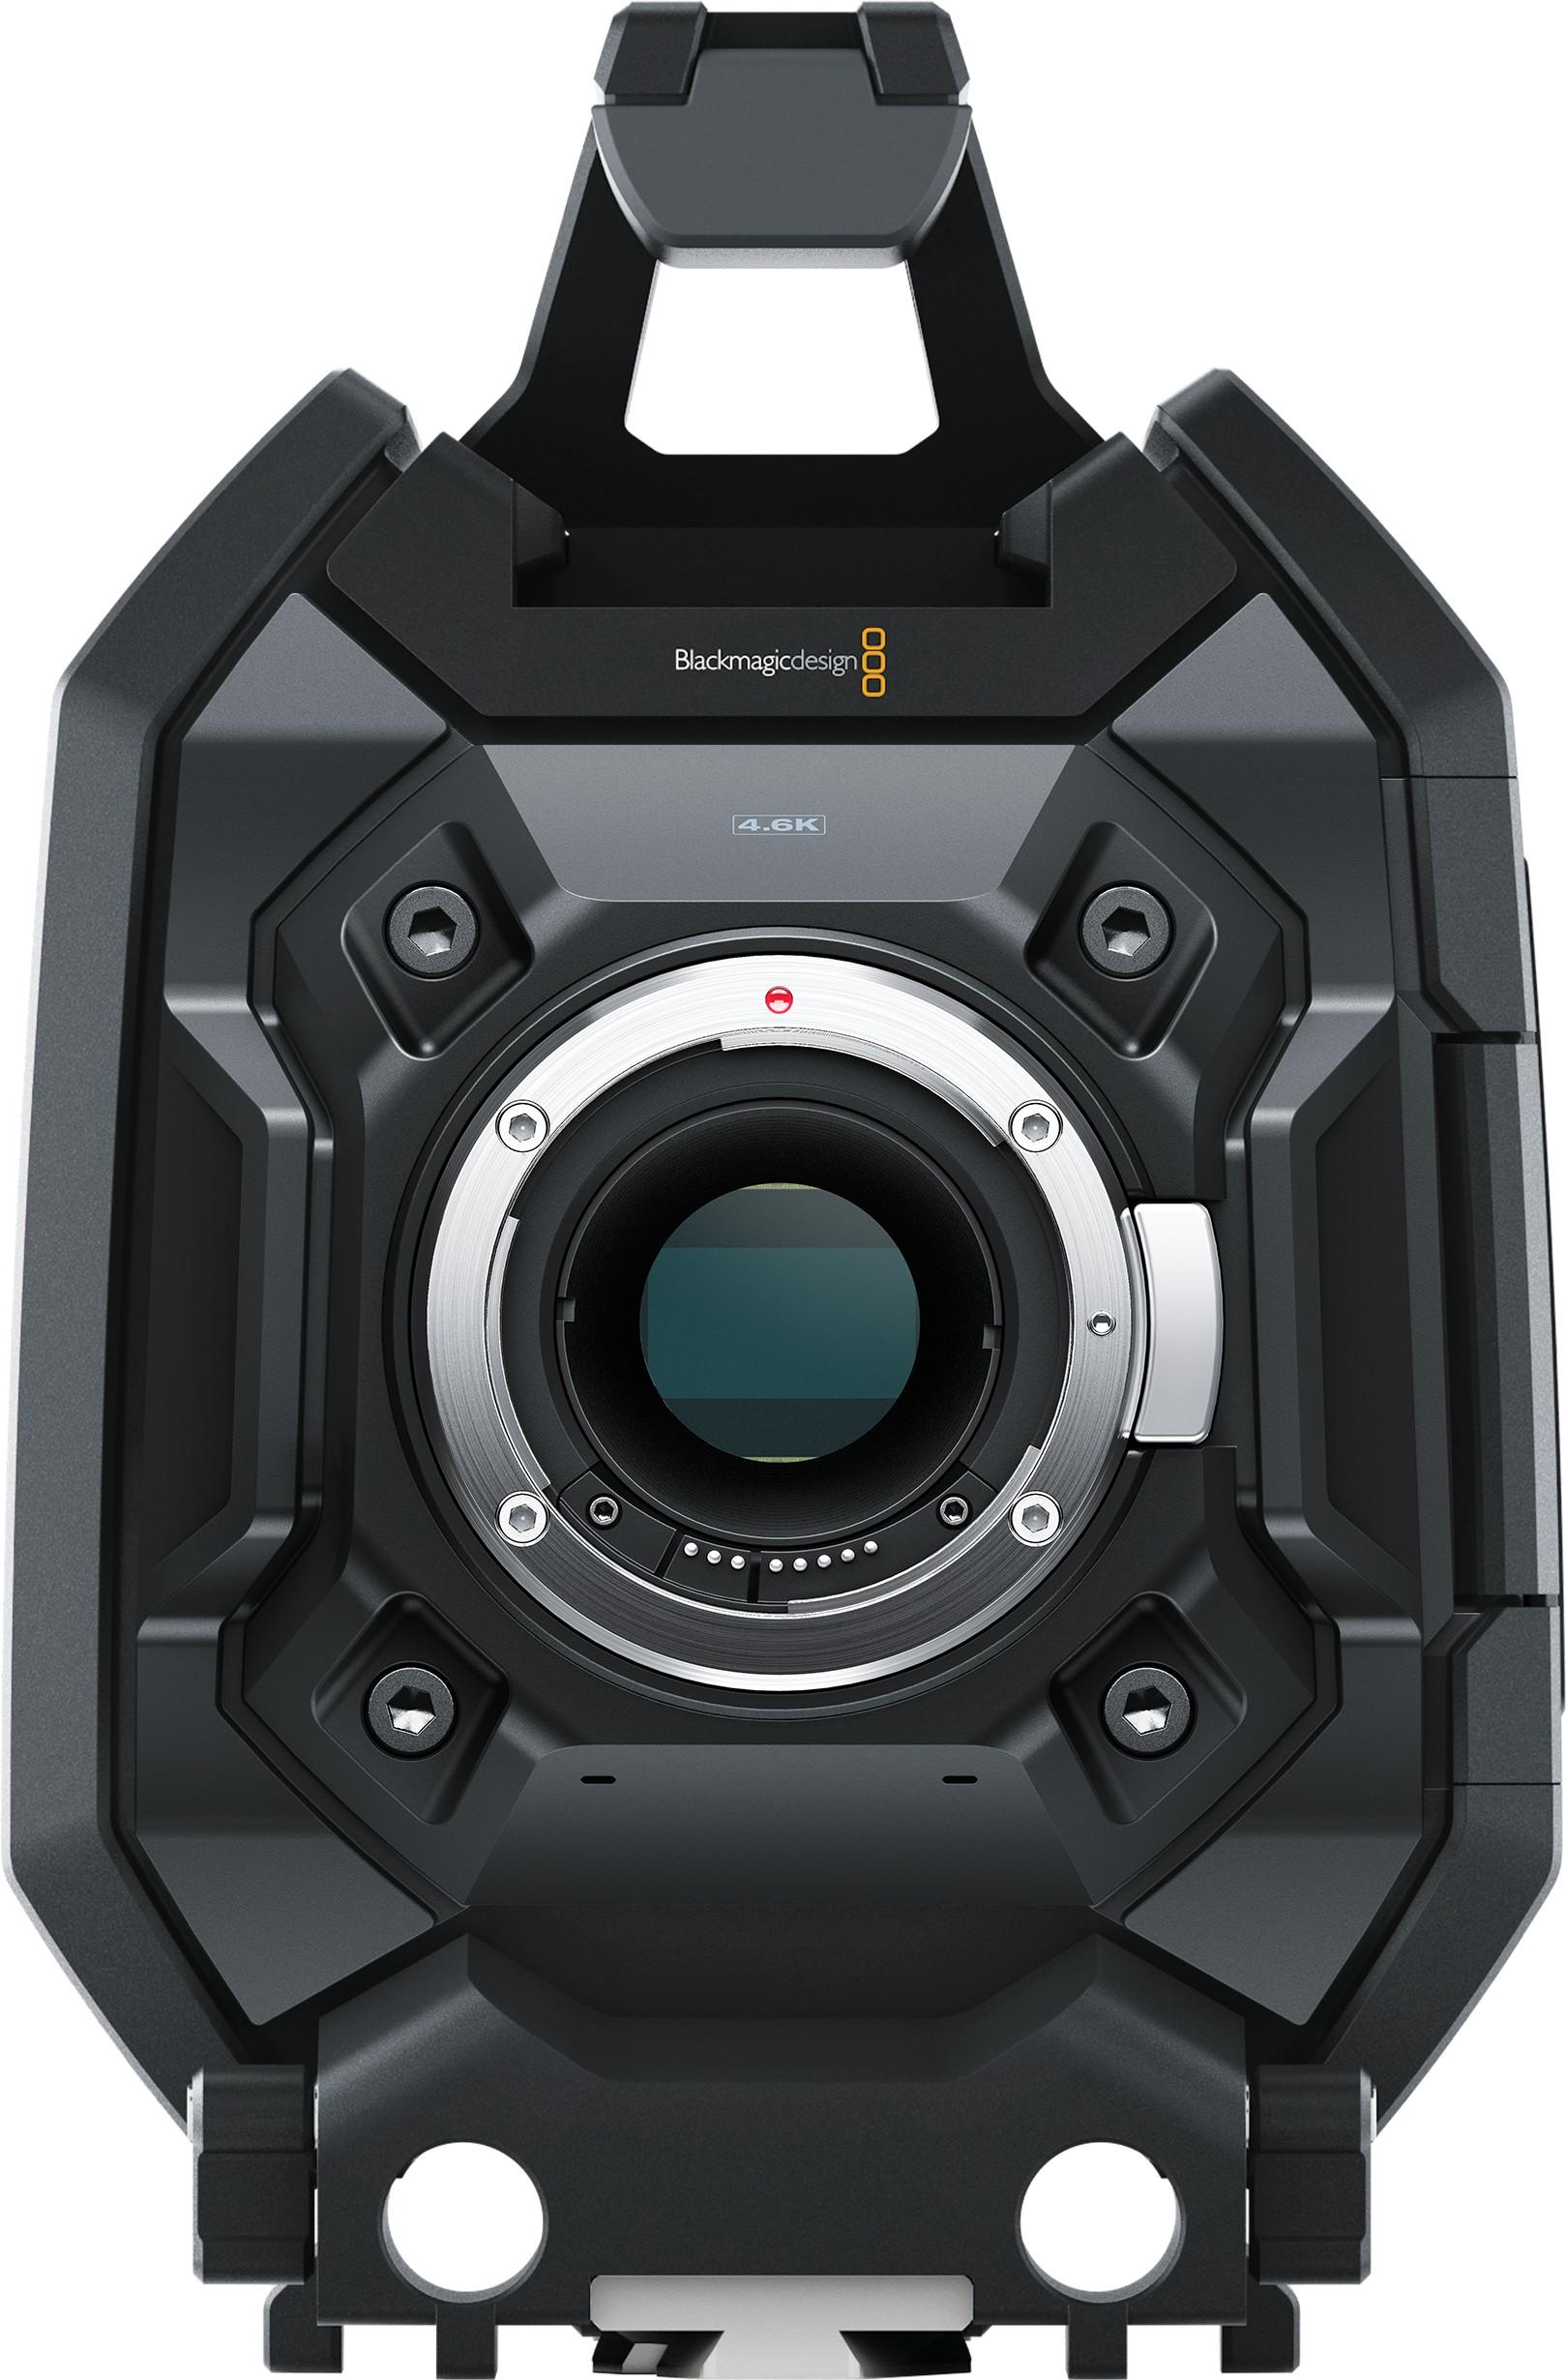 Blackmagic Design URSA Mini 4.6K Camera with EF Mount, 4K Super 35 Sensor and an Incredible 15 Stops of Dynamic Range